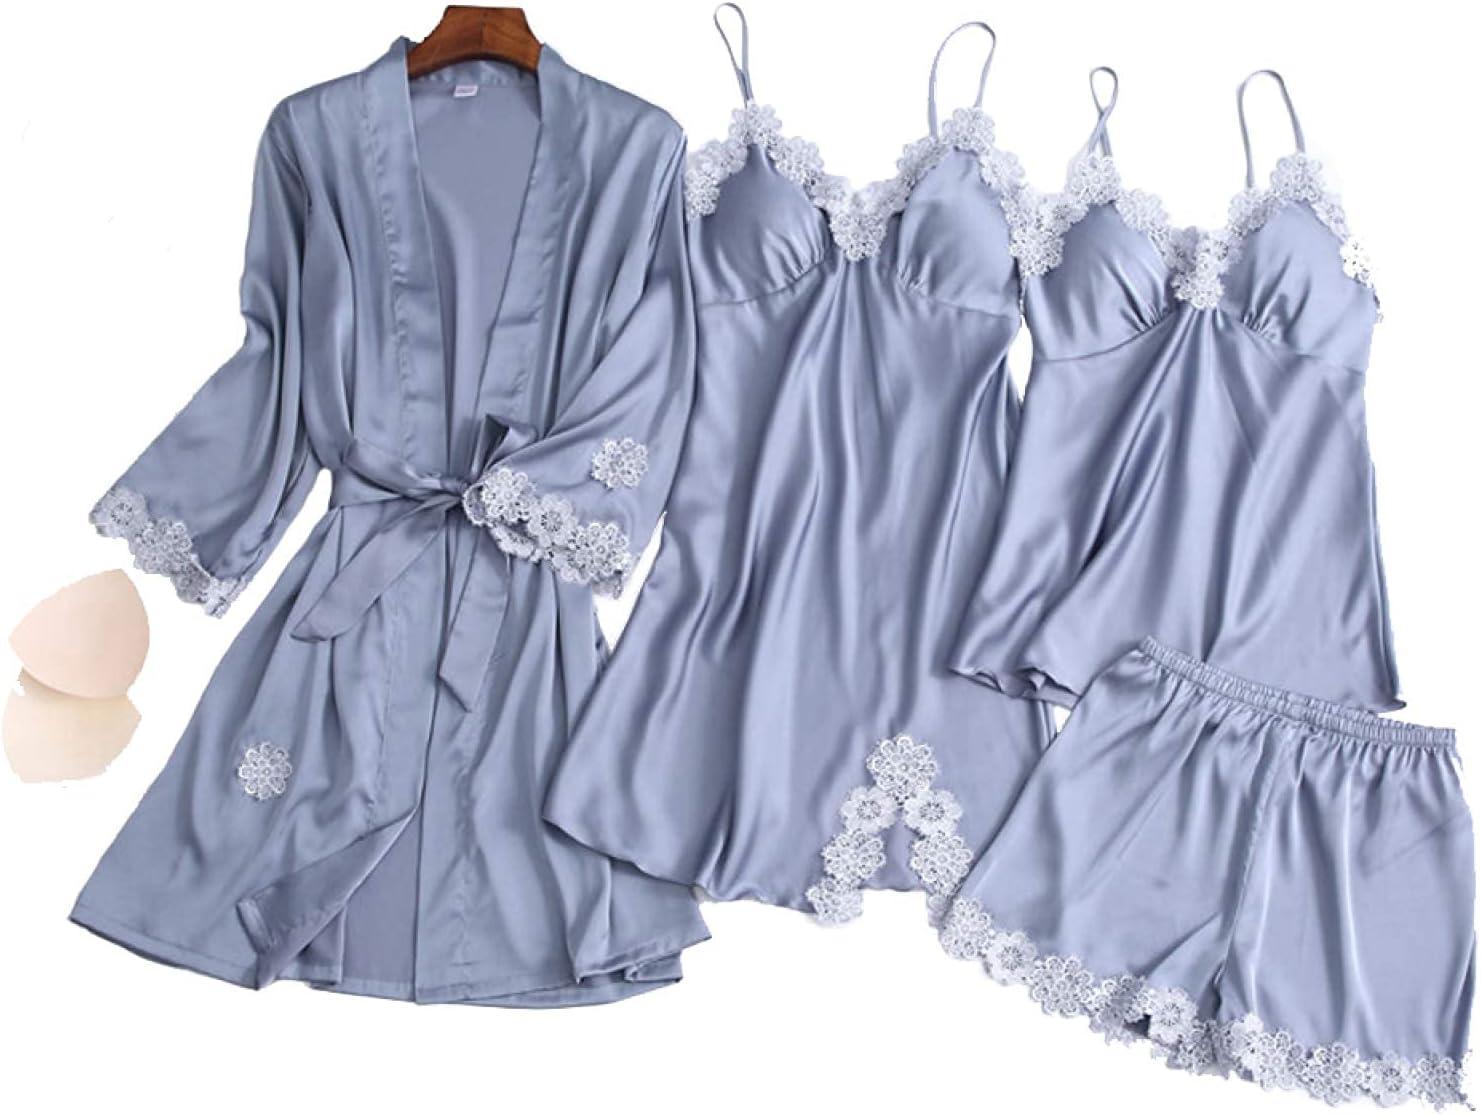 FMOGG 4 Piece Womens Pajama Set, Silk Satin Lace Cami Sleepwear